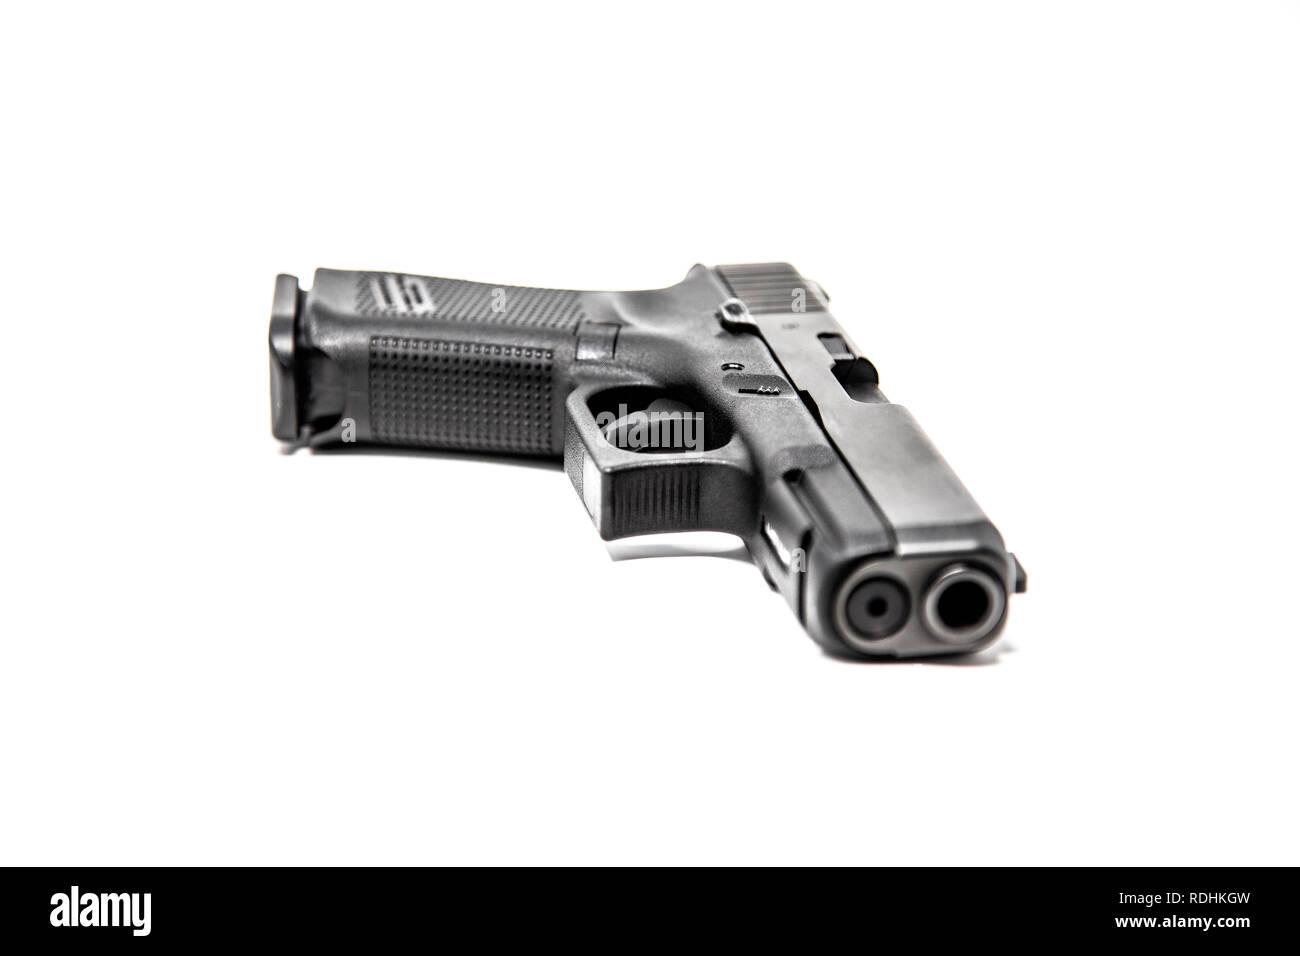 Black Semi-Automatic Handgun on White Background - Stock Image